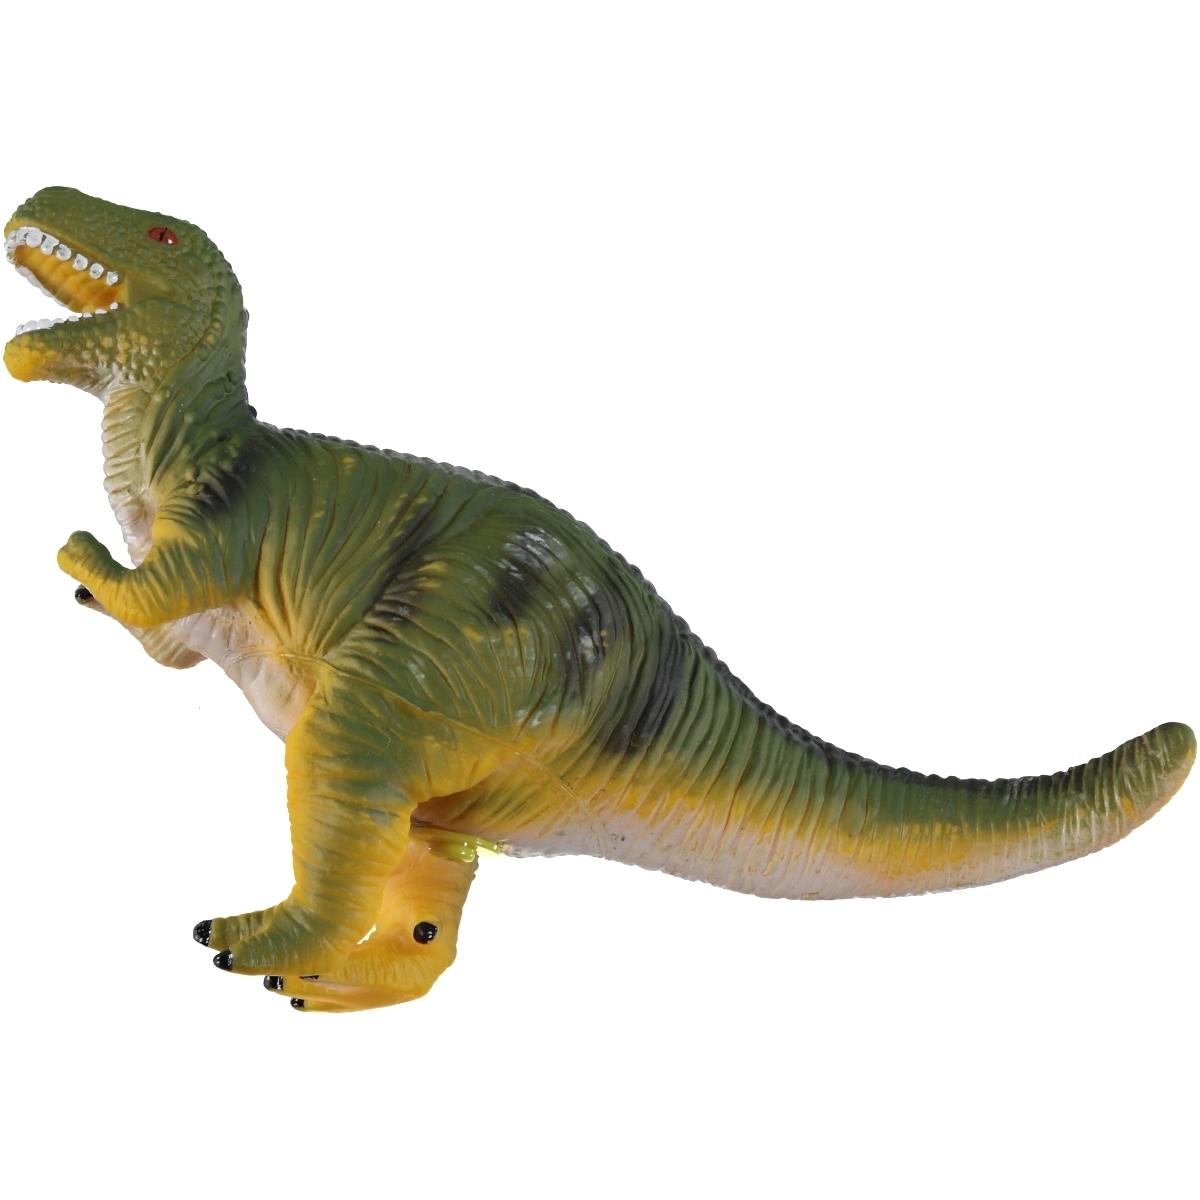 Can Oyuncak X777 3 Std Can Oyuncak Dinozor Tyrannosaurus Rex 3 Yaş